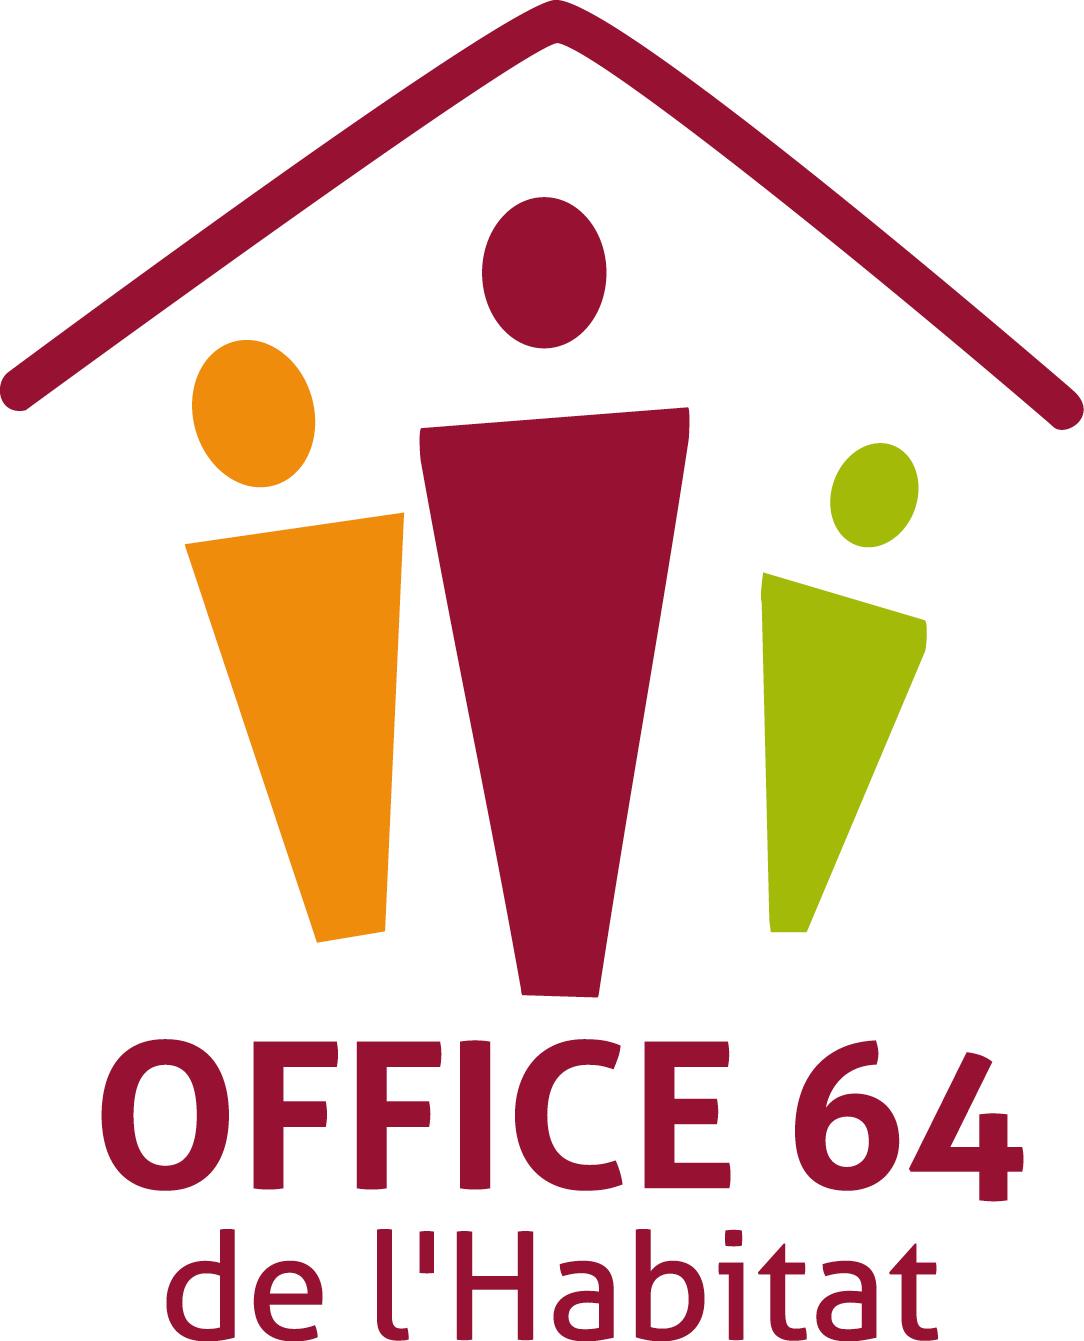 https://www.traiteur-biarritz.fr/img/img/logos-clients/logo-office-64.jpg